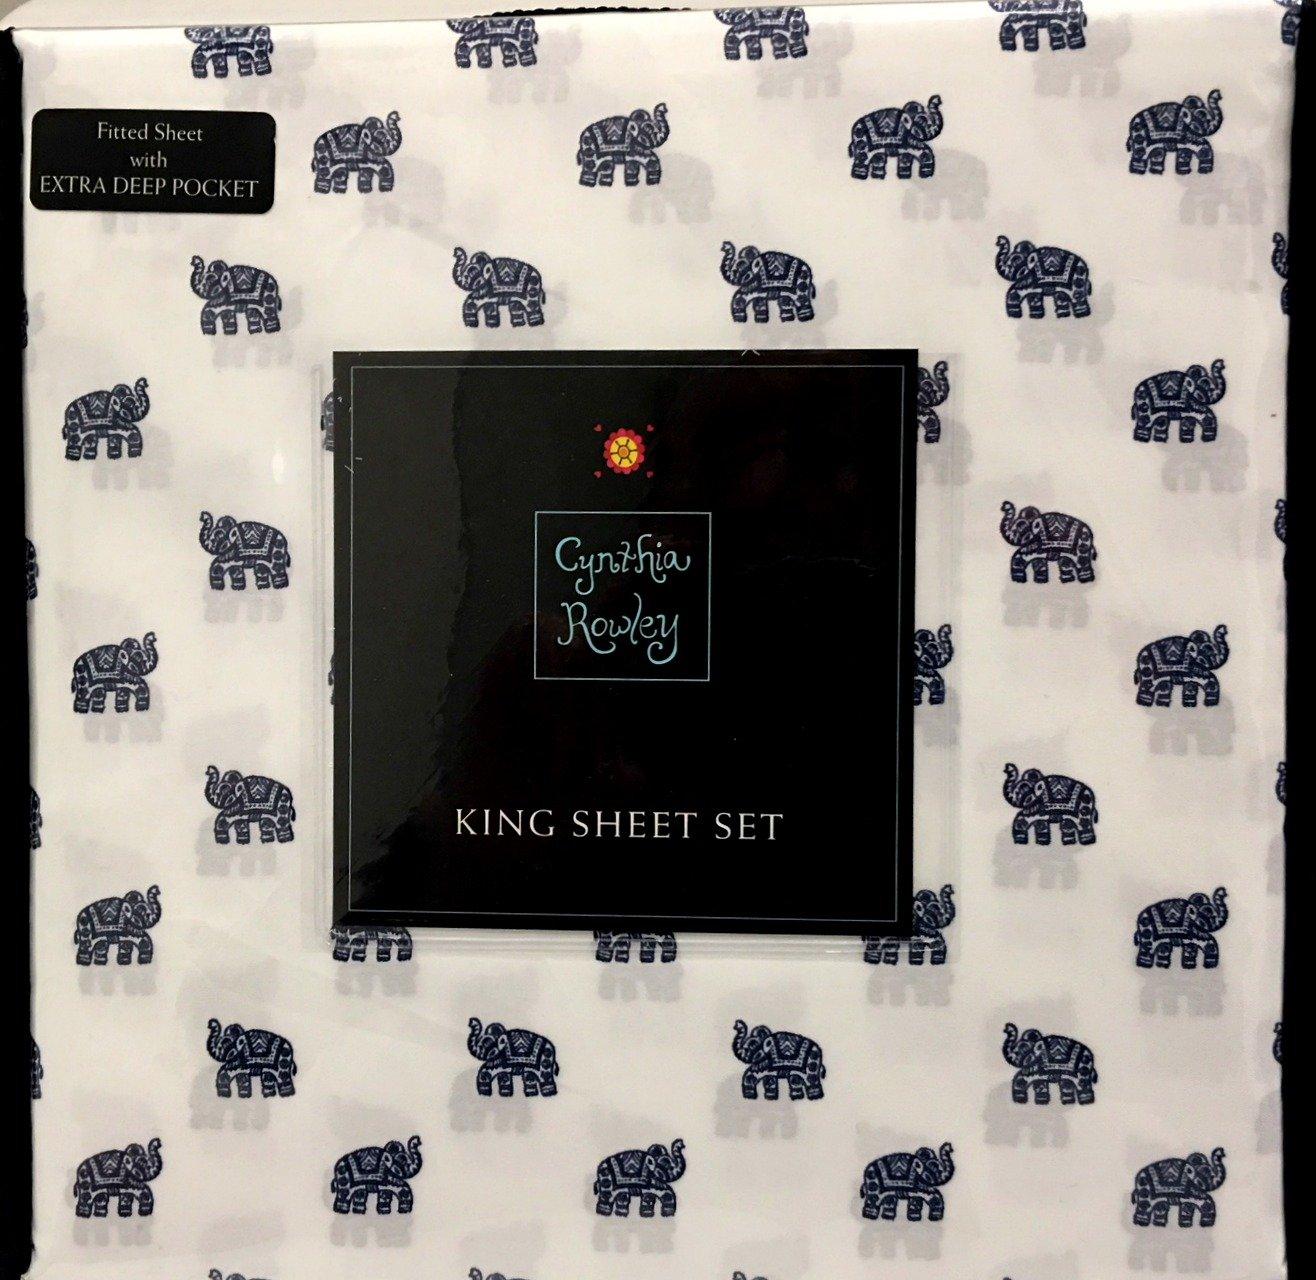 Cynthia Rowley 4-Piece KING Sheet Set | Navy Blue Indian Elephants on White | 100% Easy Care Microfiber